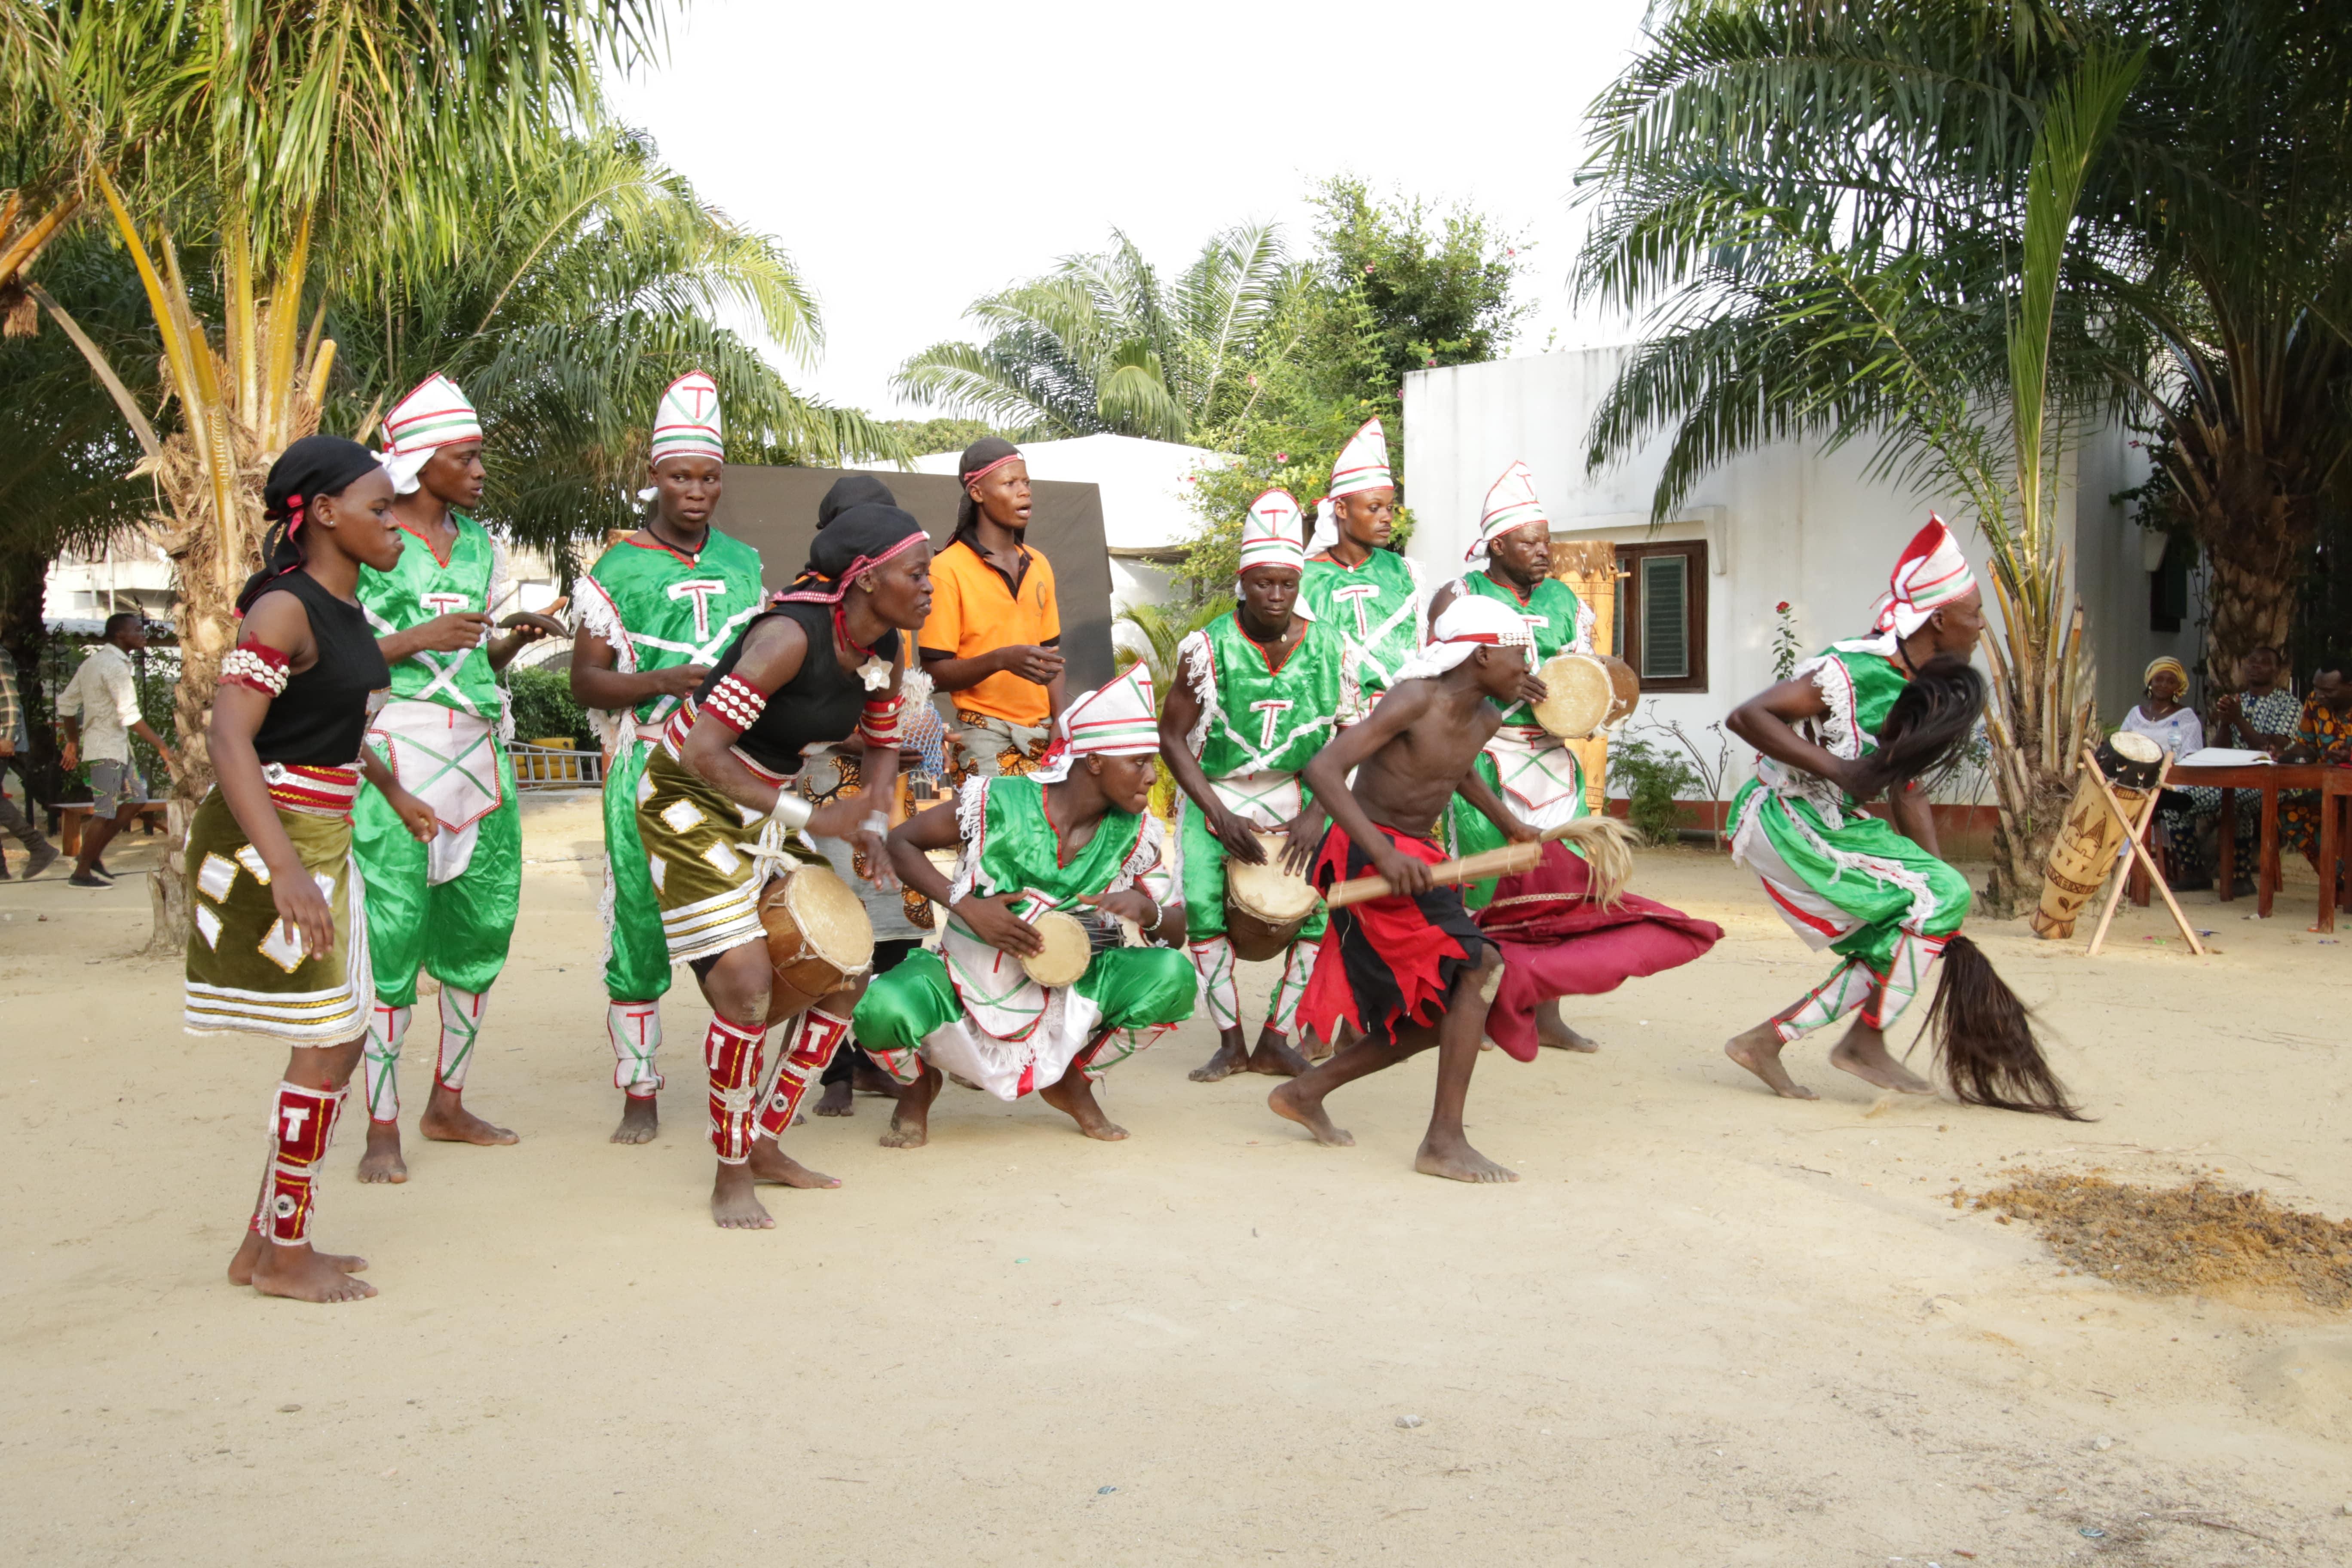 Danse traditionnelle avec la Compagnie artistique Toffodji #1